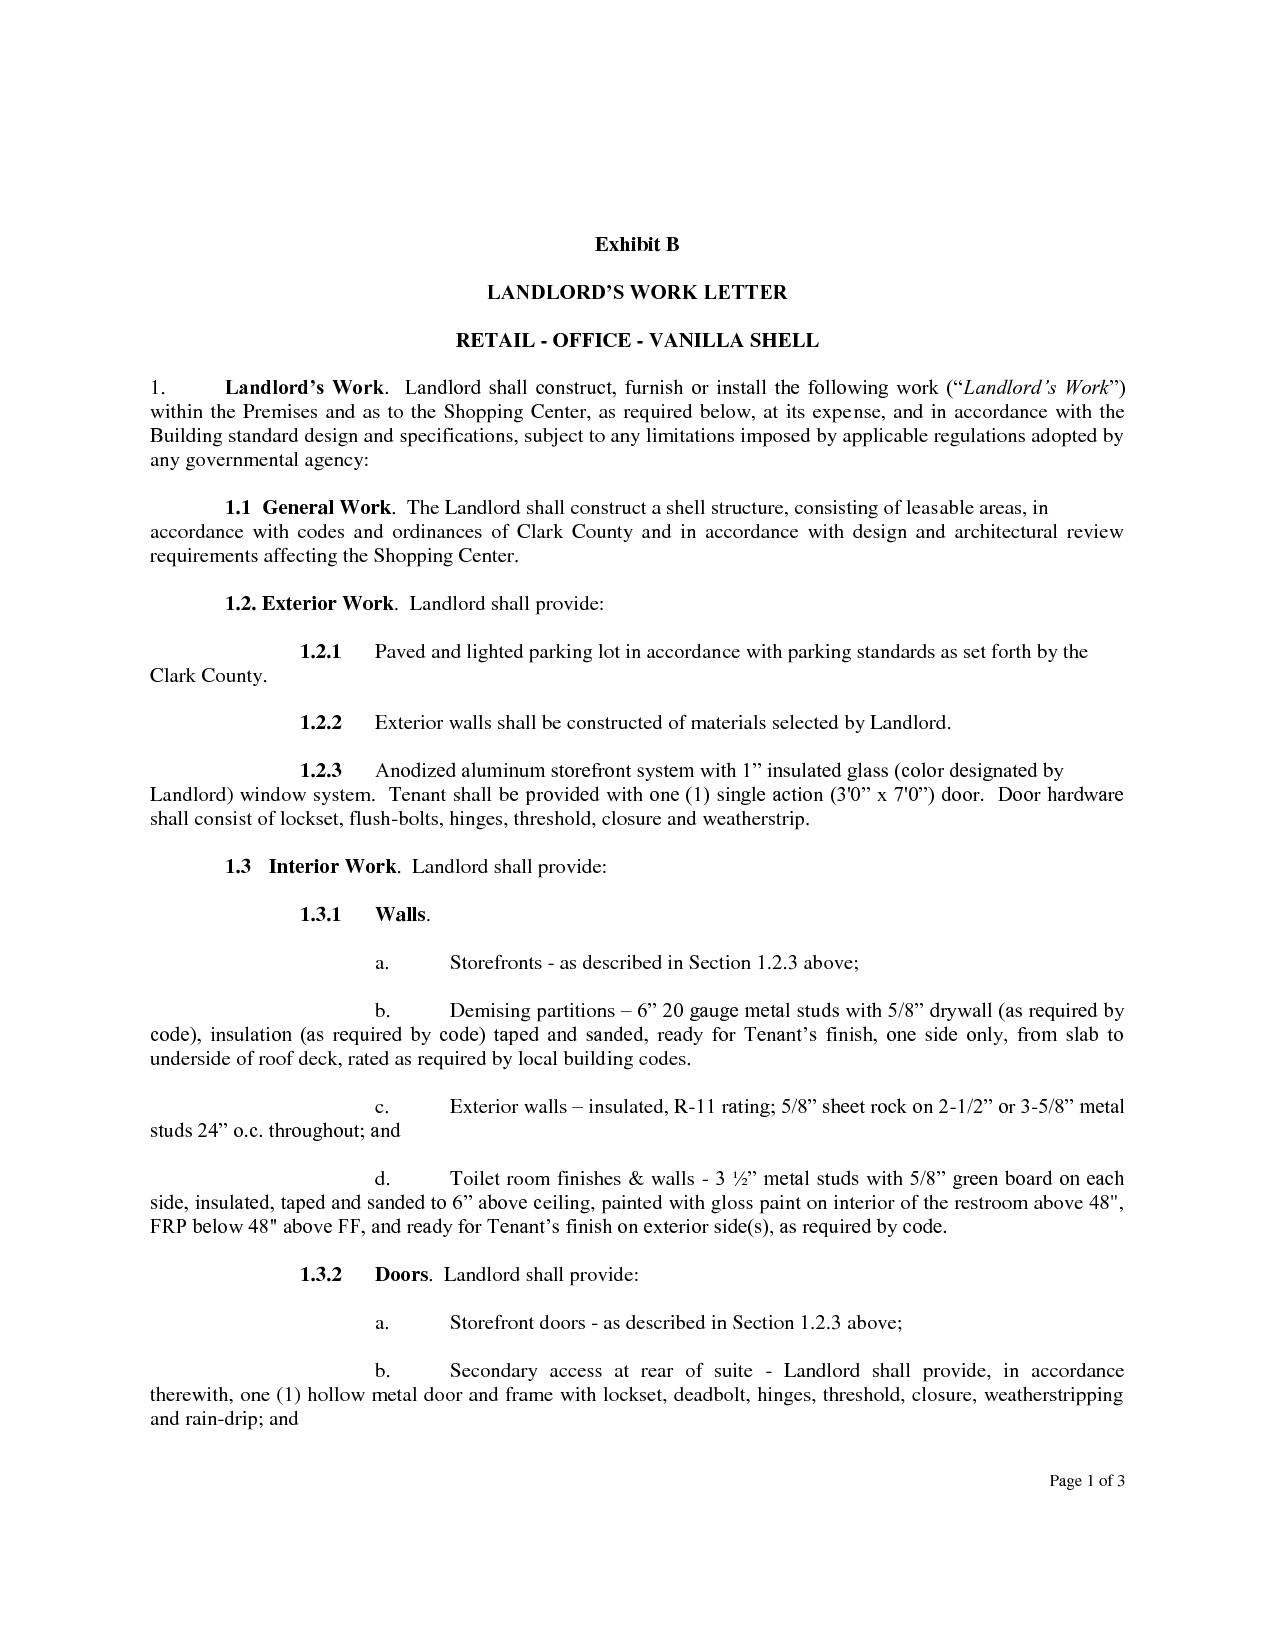 certification letter from landlord certificate employer sample